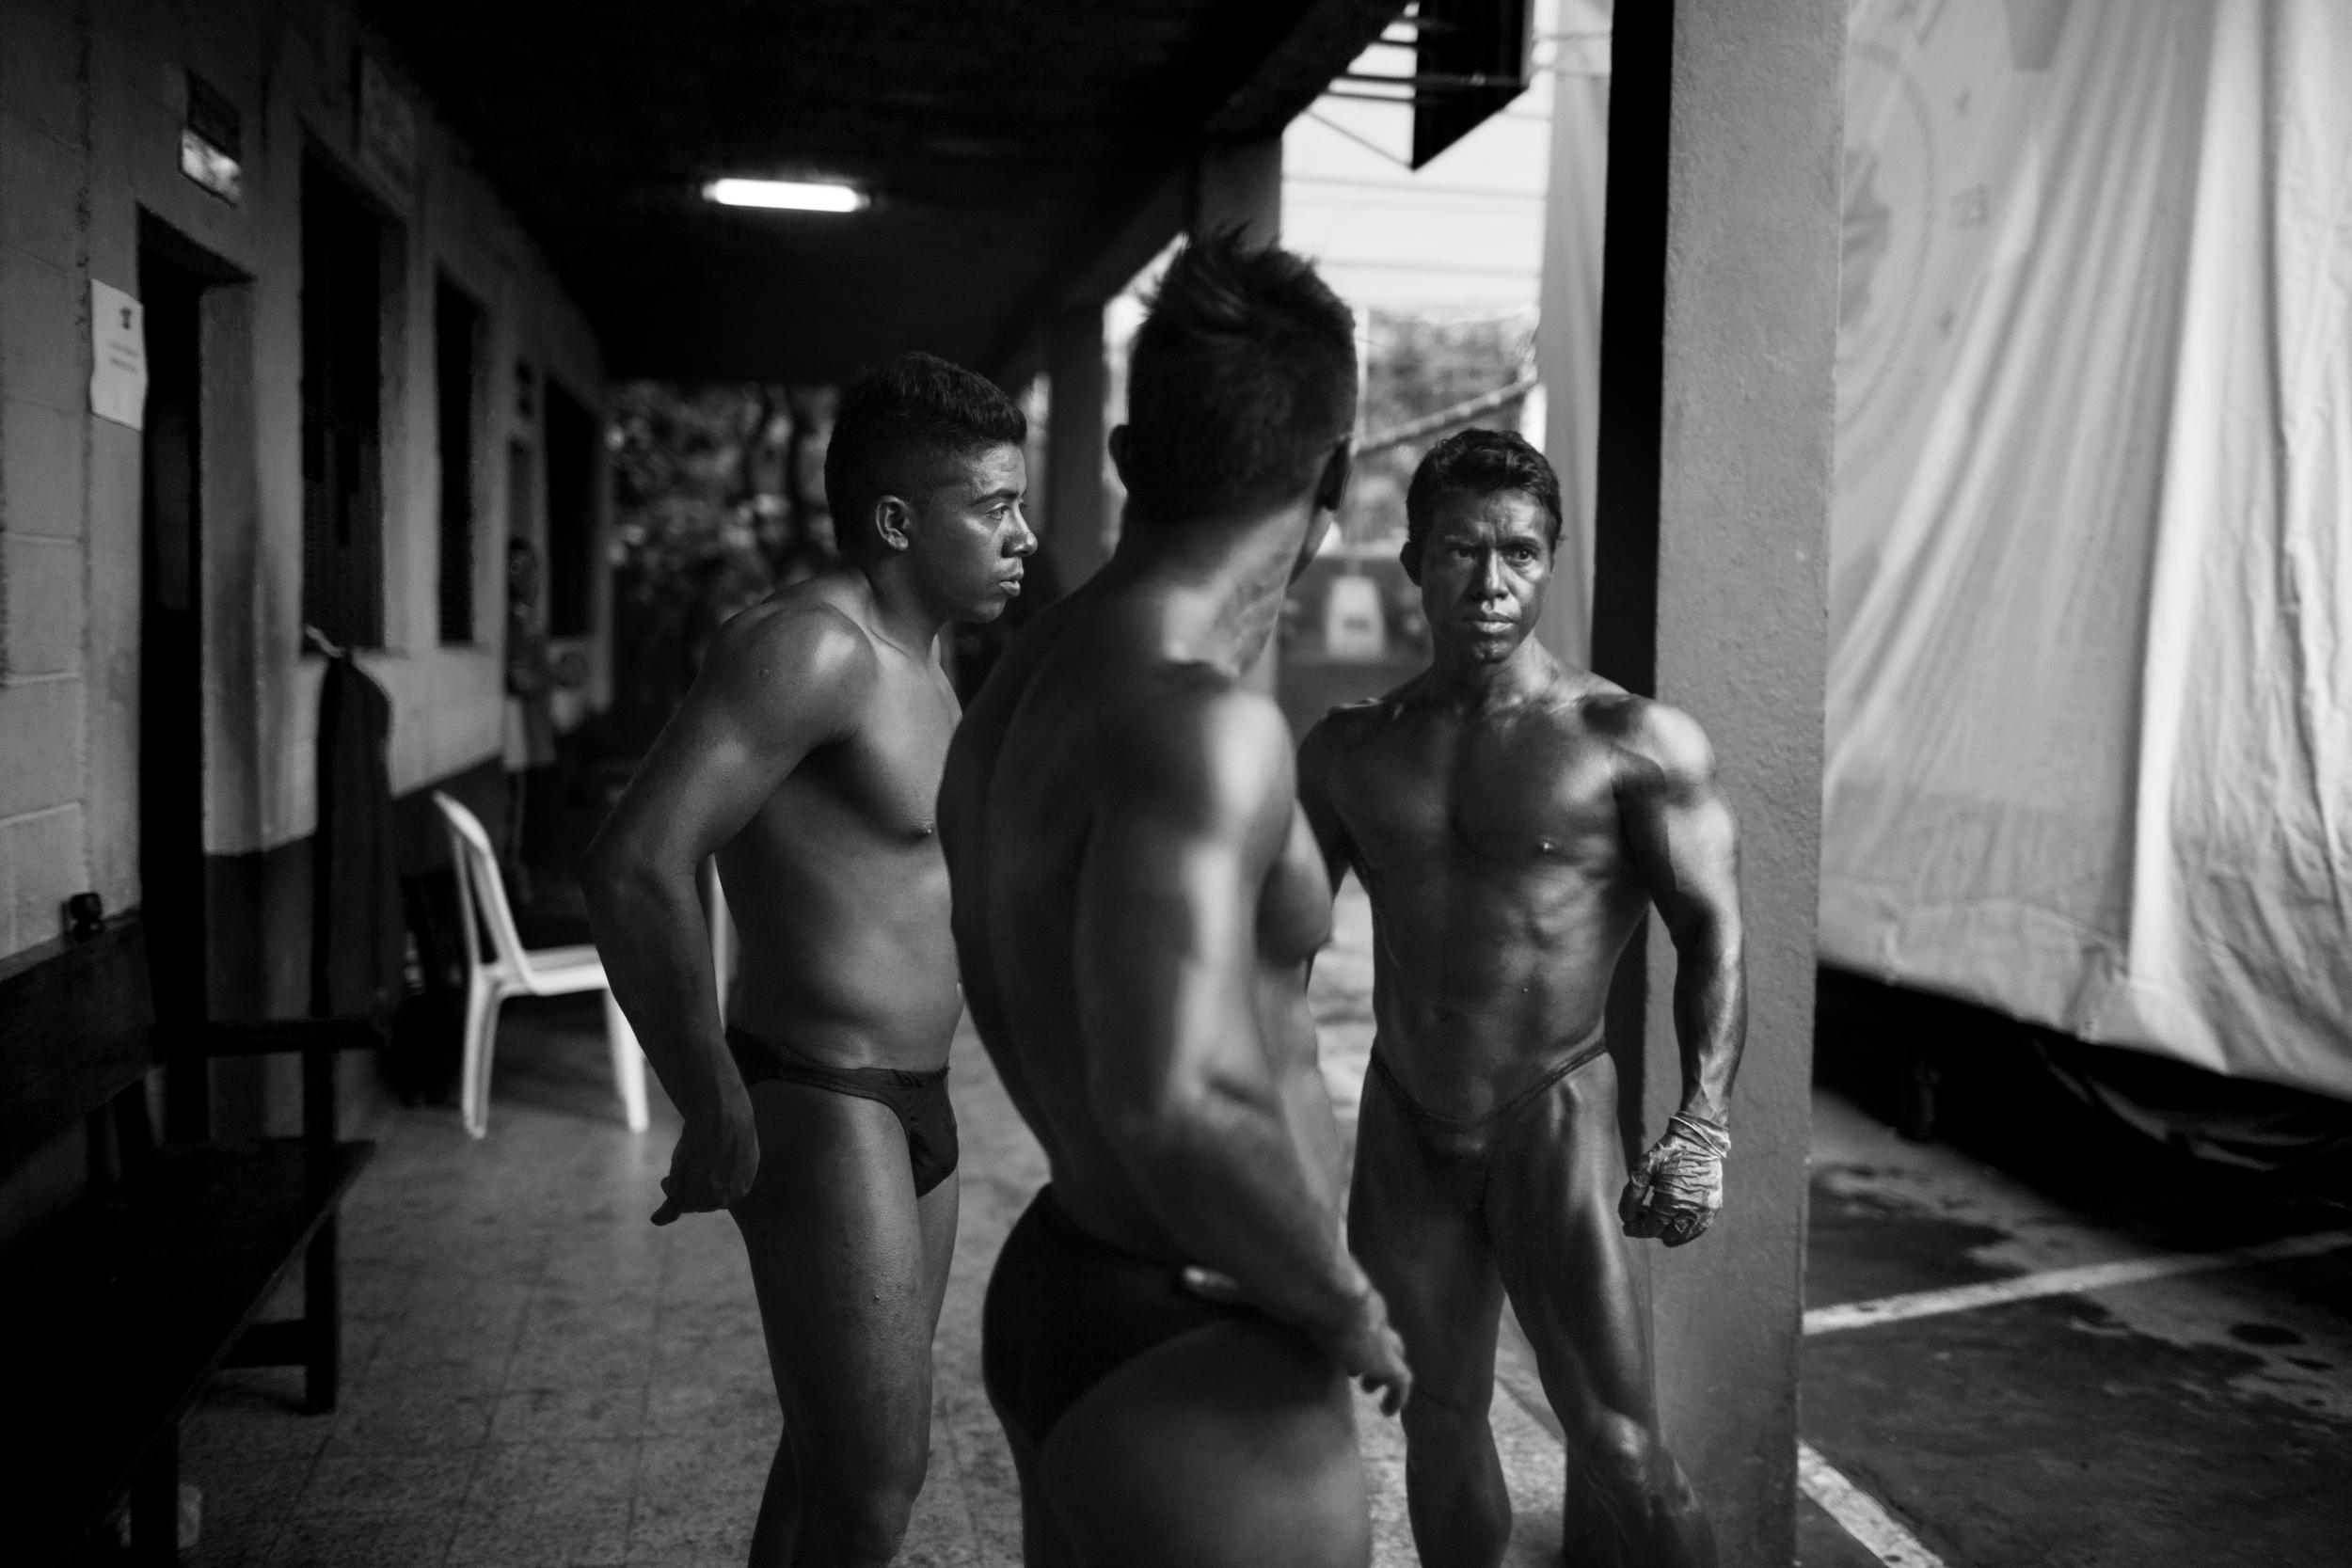 Competitors before the Gimnasio La Fábrica bodybuilding contest in Antigua, Guatemala.